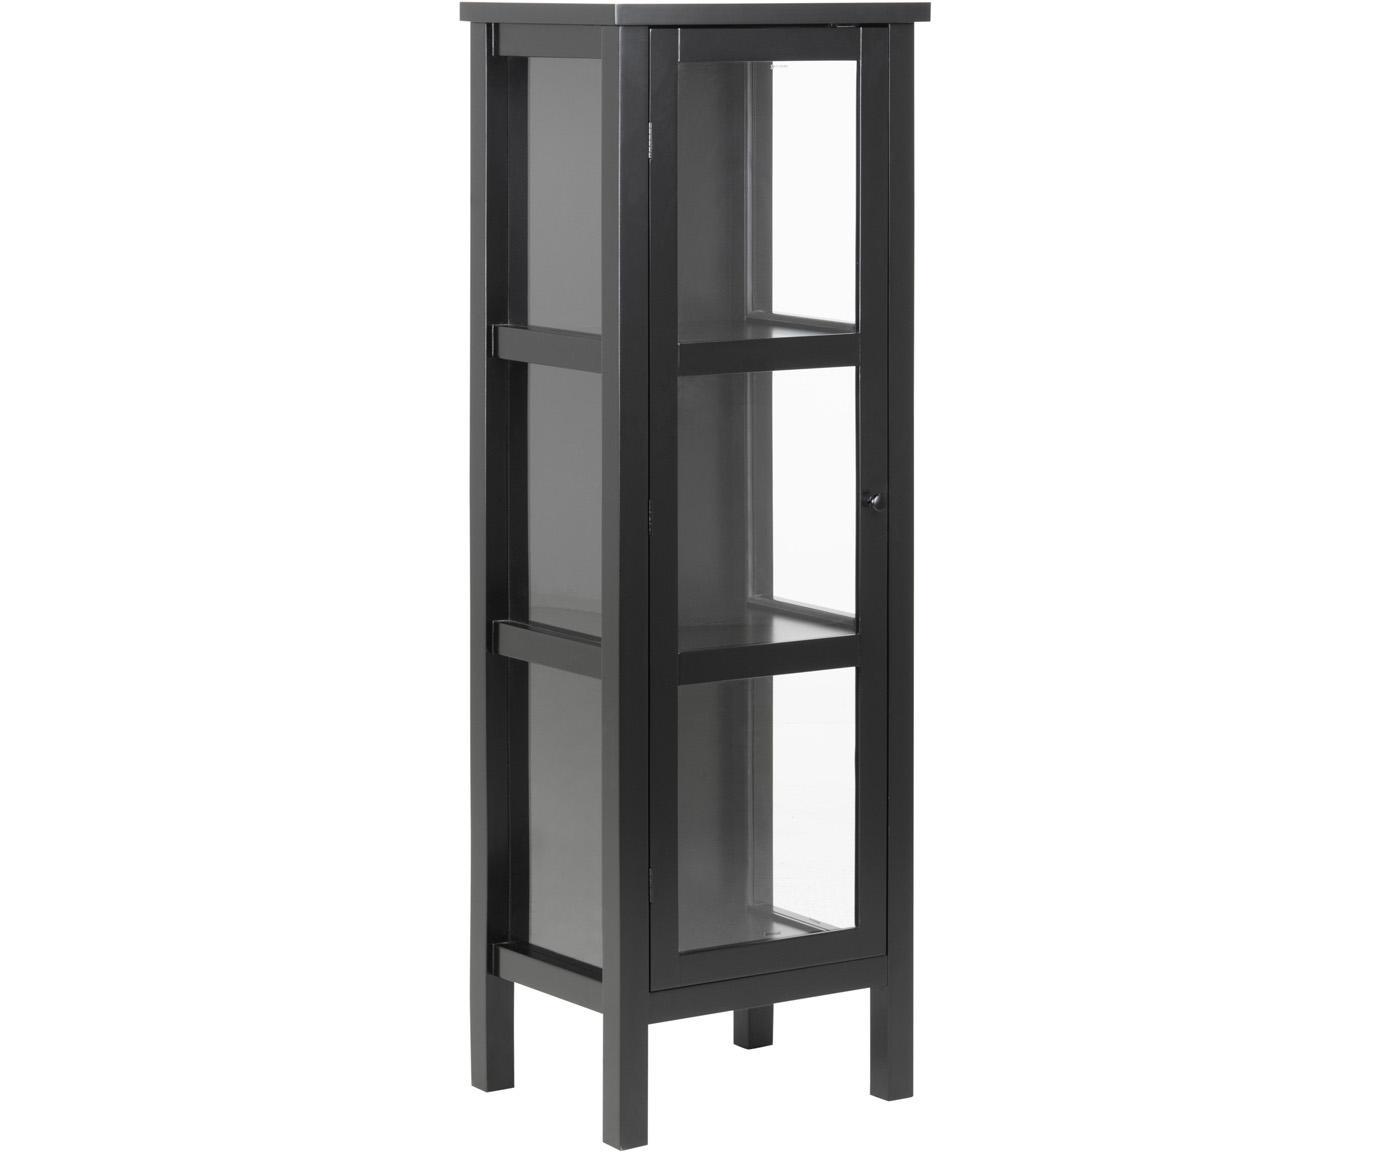 Vitrina Eton, Estructura: tablero de fibras de dens, Negro, An 36 x Al 137 cm